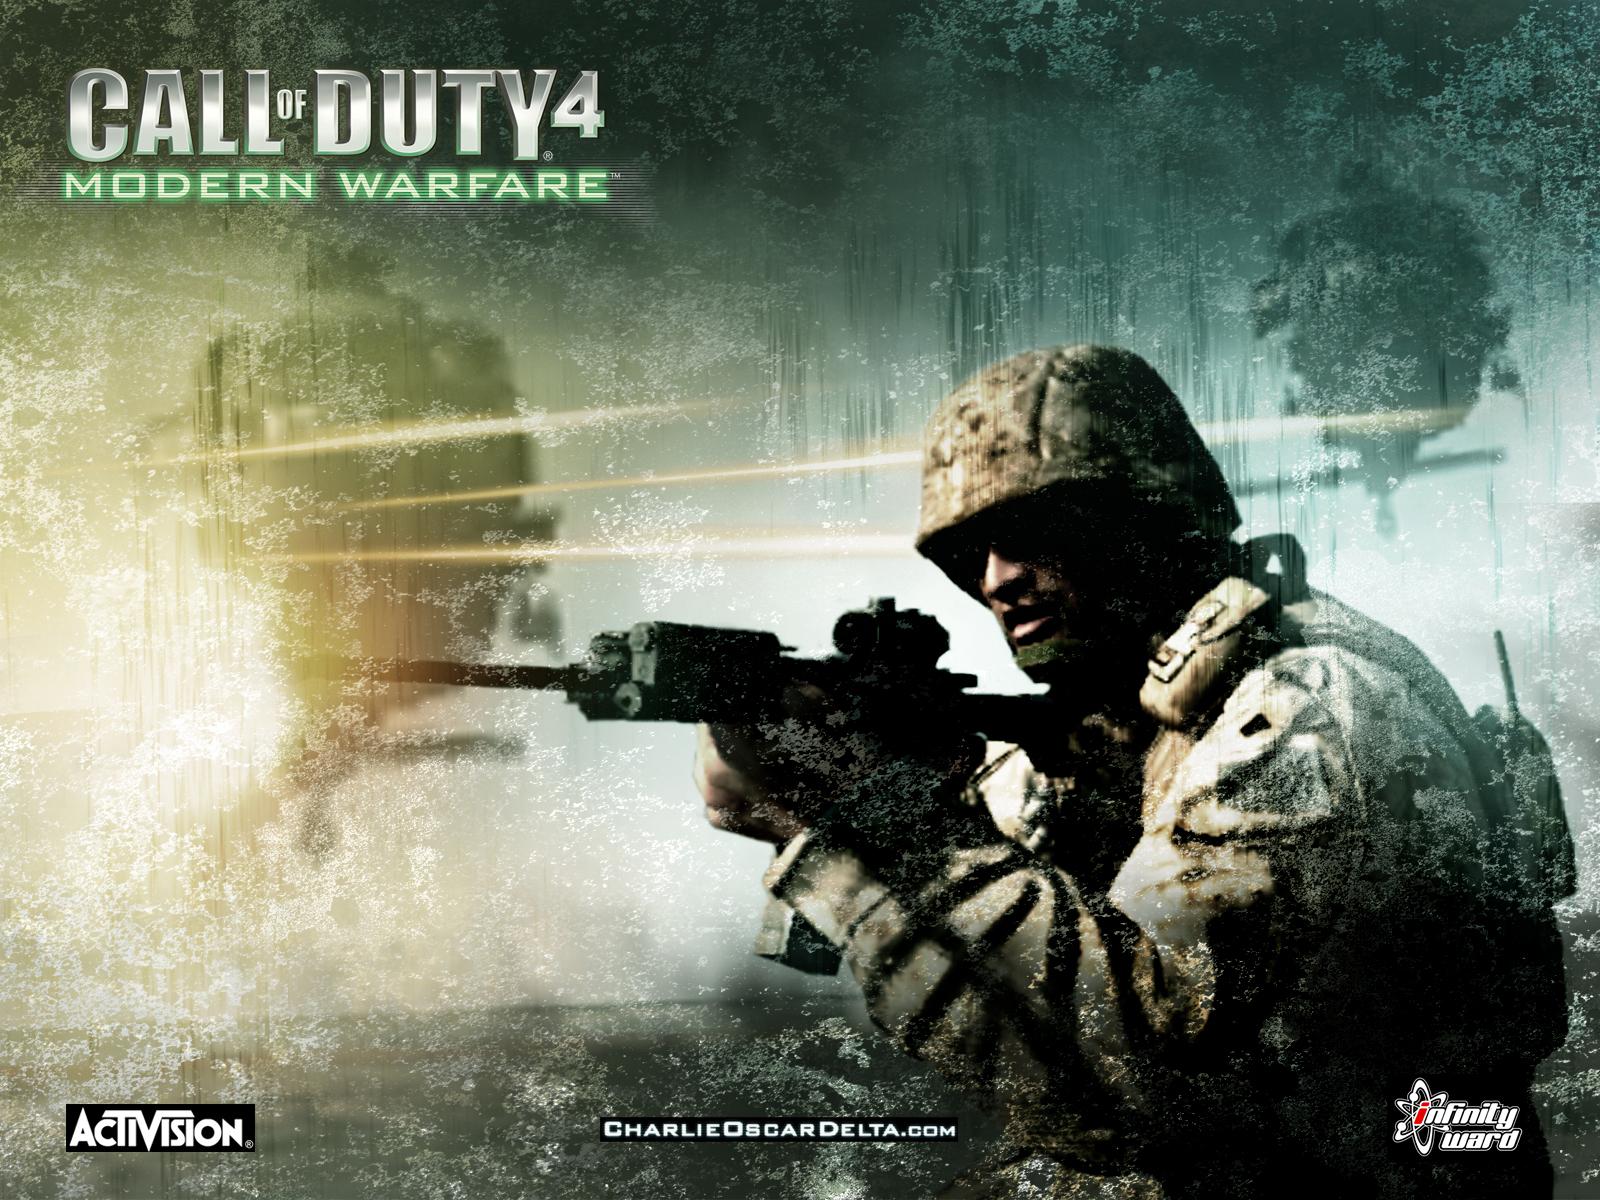 Call of Duty 4: Modern Warfare - Wallpaper 2.